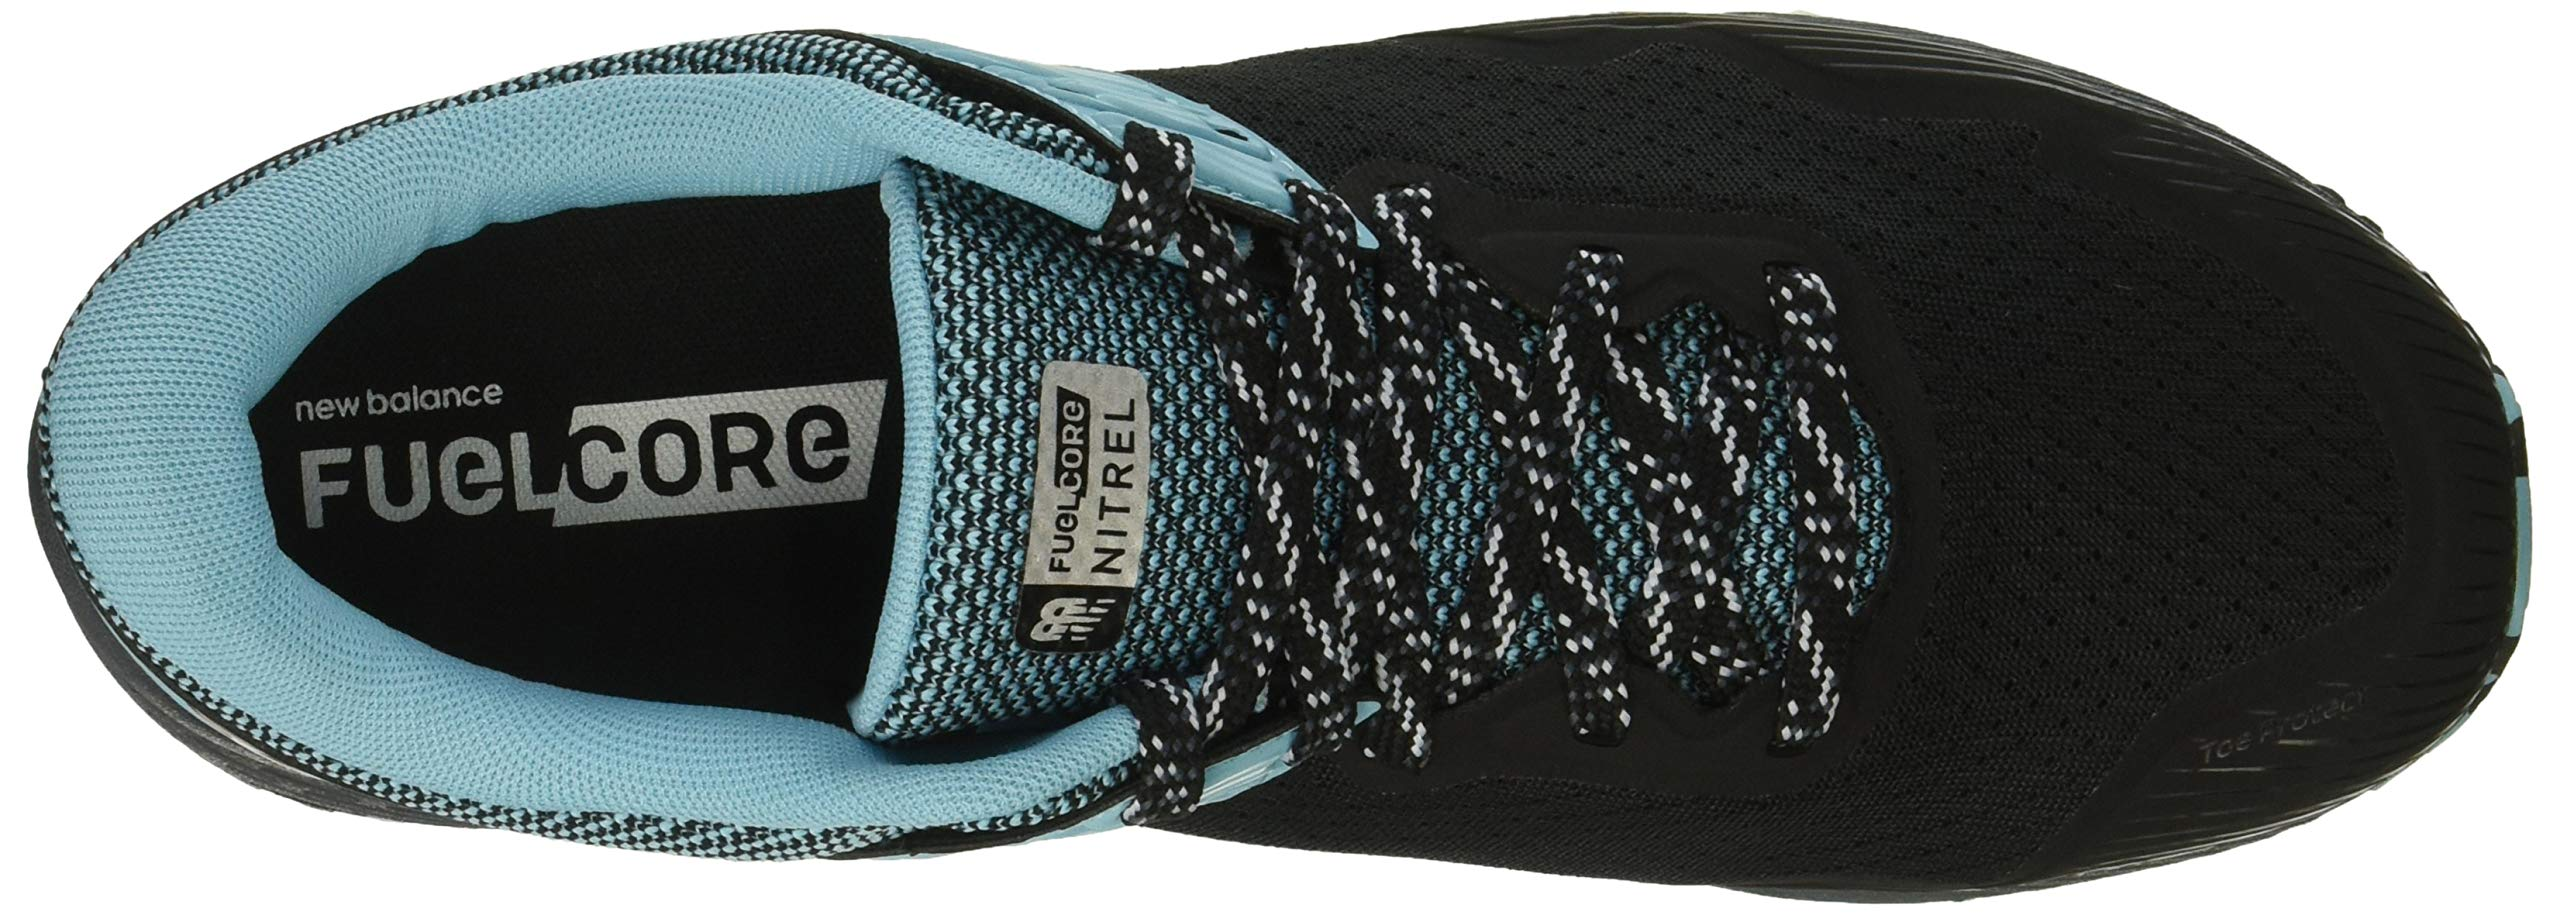 New Balance Women's Nitrel V2 FuelCore Trail Running Shoe Black/Thunder/Enamel Blue 5.5 B US by New Balance (Image #8)